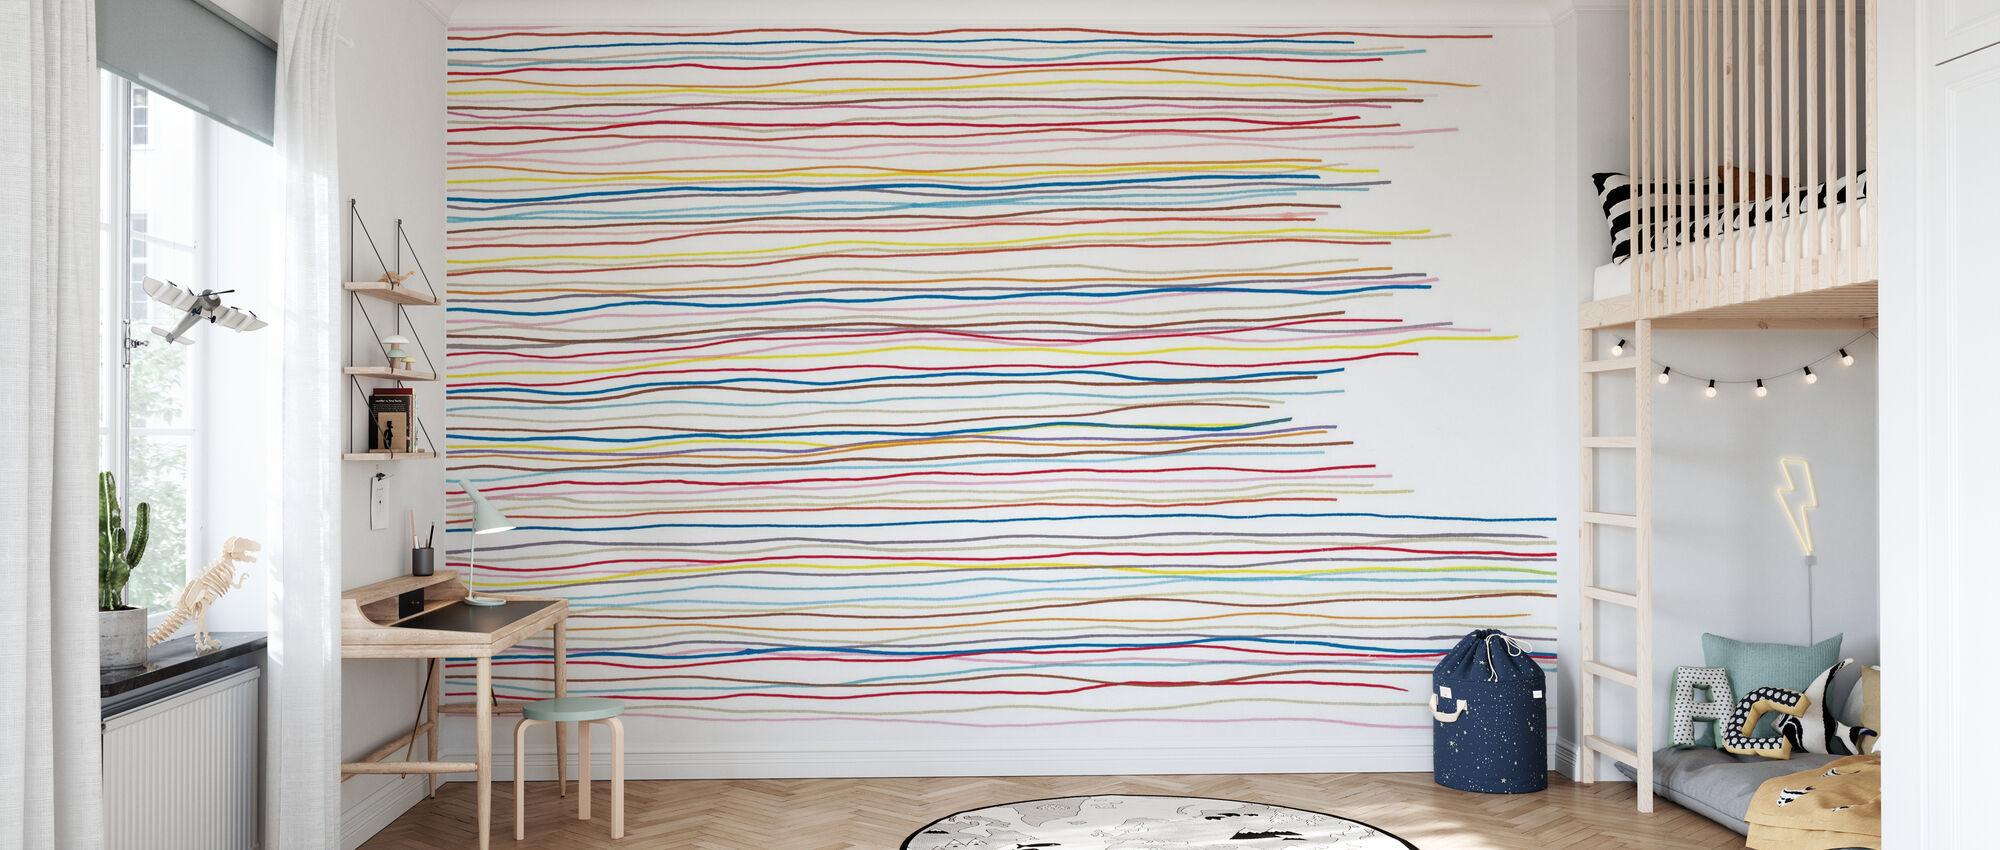 Variegated Stripes - Wallpaper - Kids Room